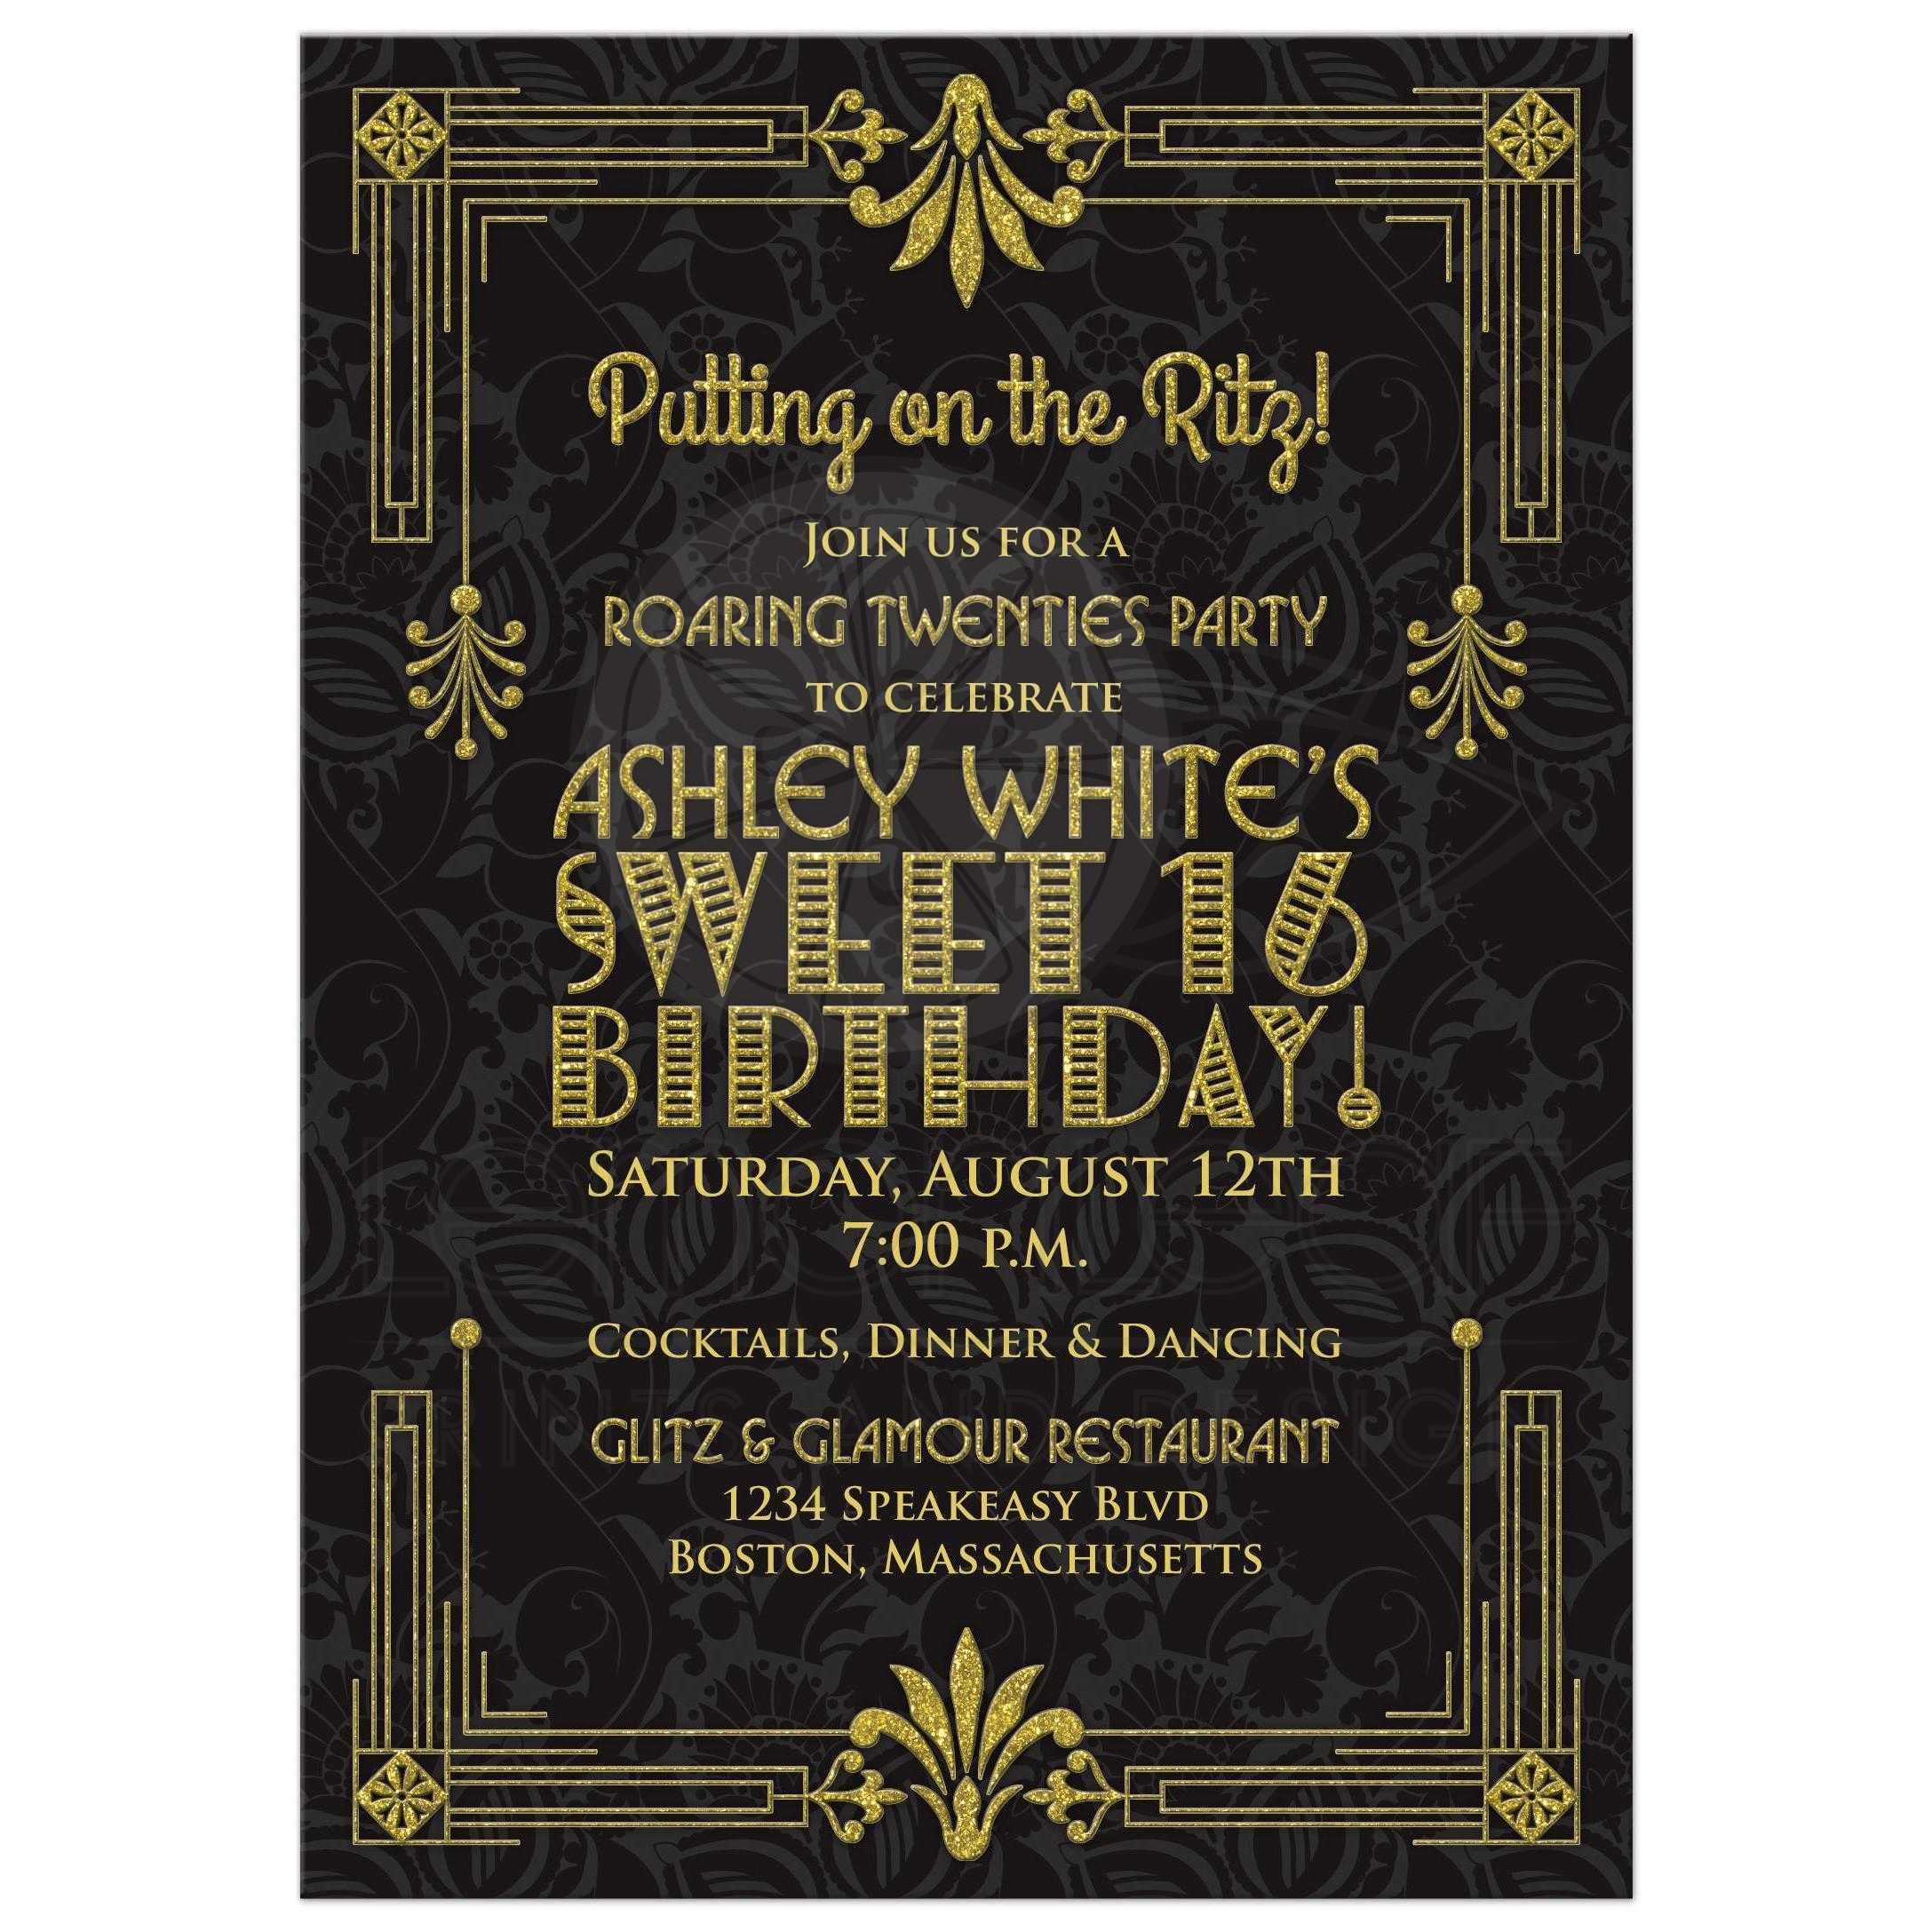 Sweet 16 Birthday Invitation Roaring 20s Art Deco Black Gold